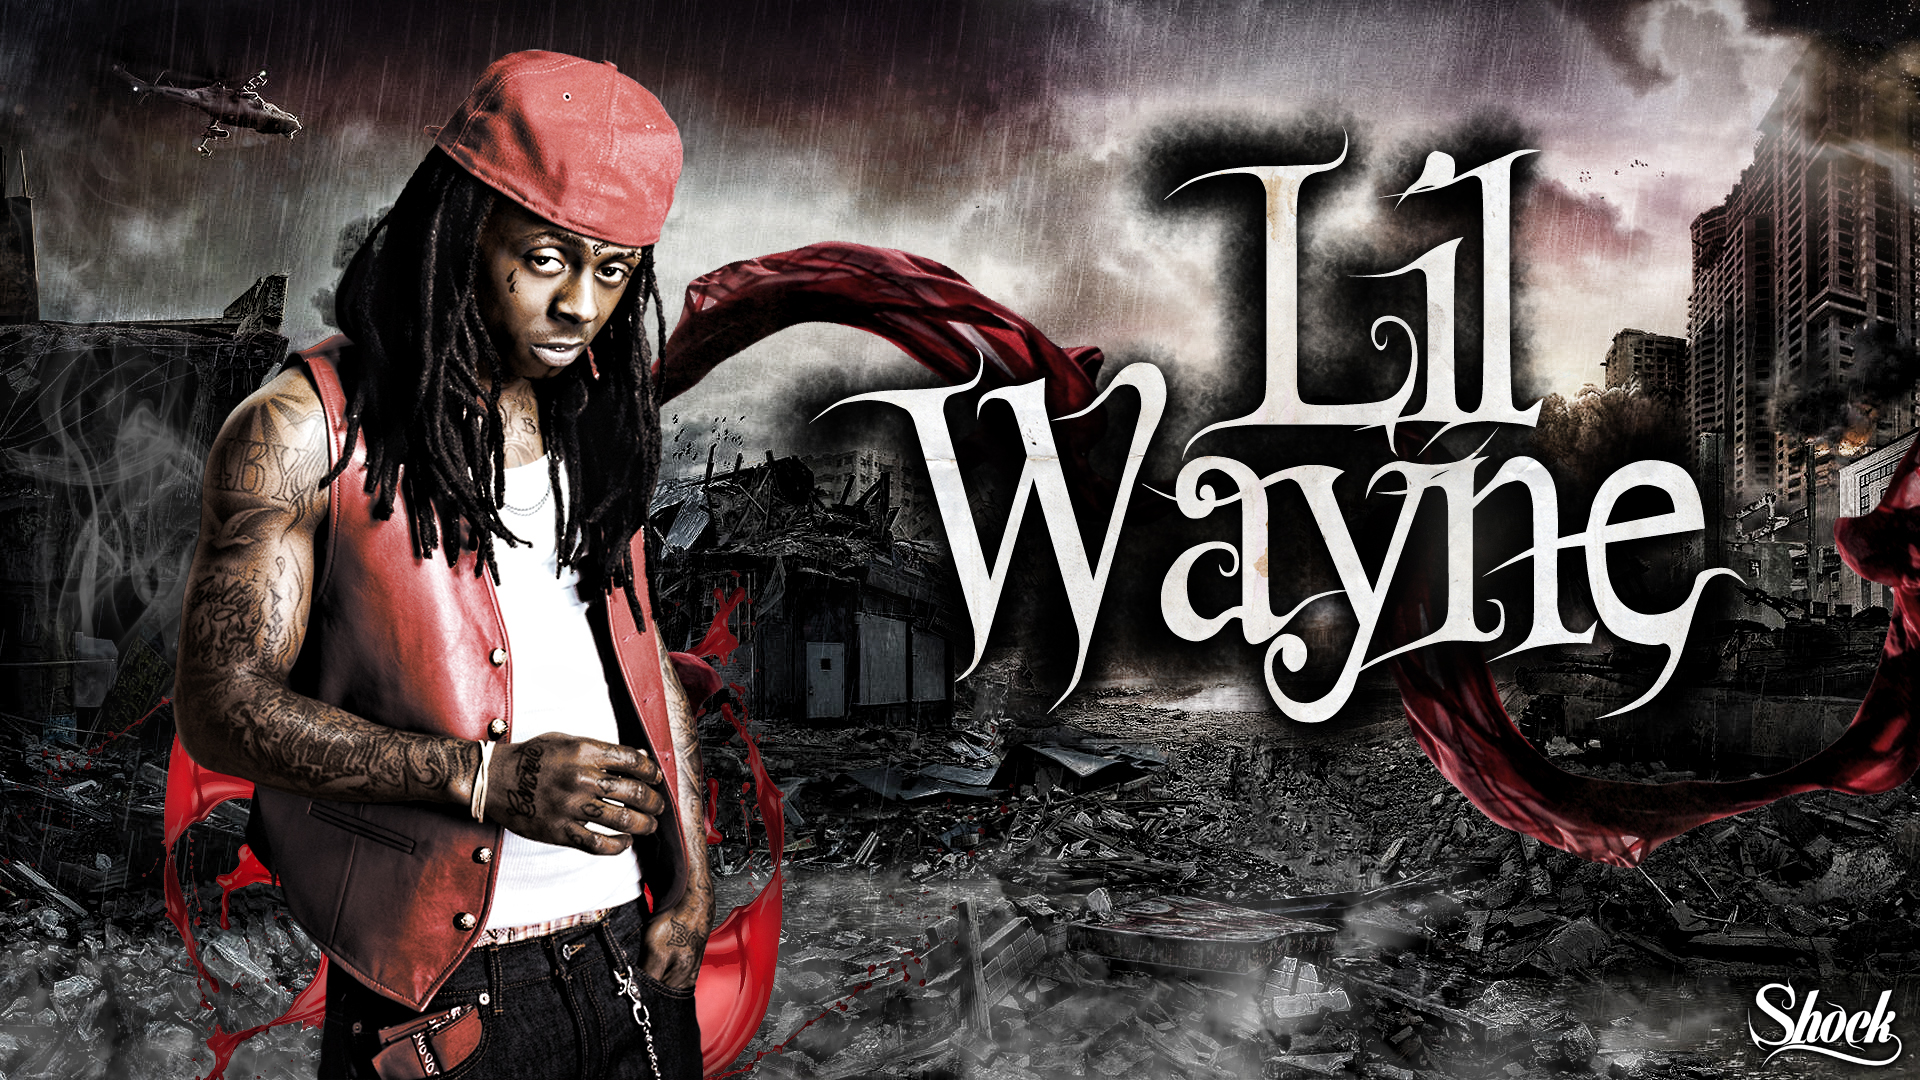 Lil Wayne HD 4 Rap Wallpapers 1920x1080